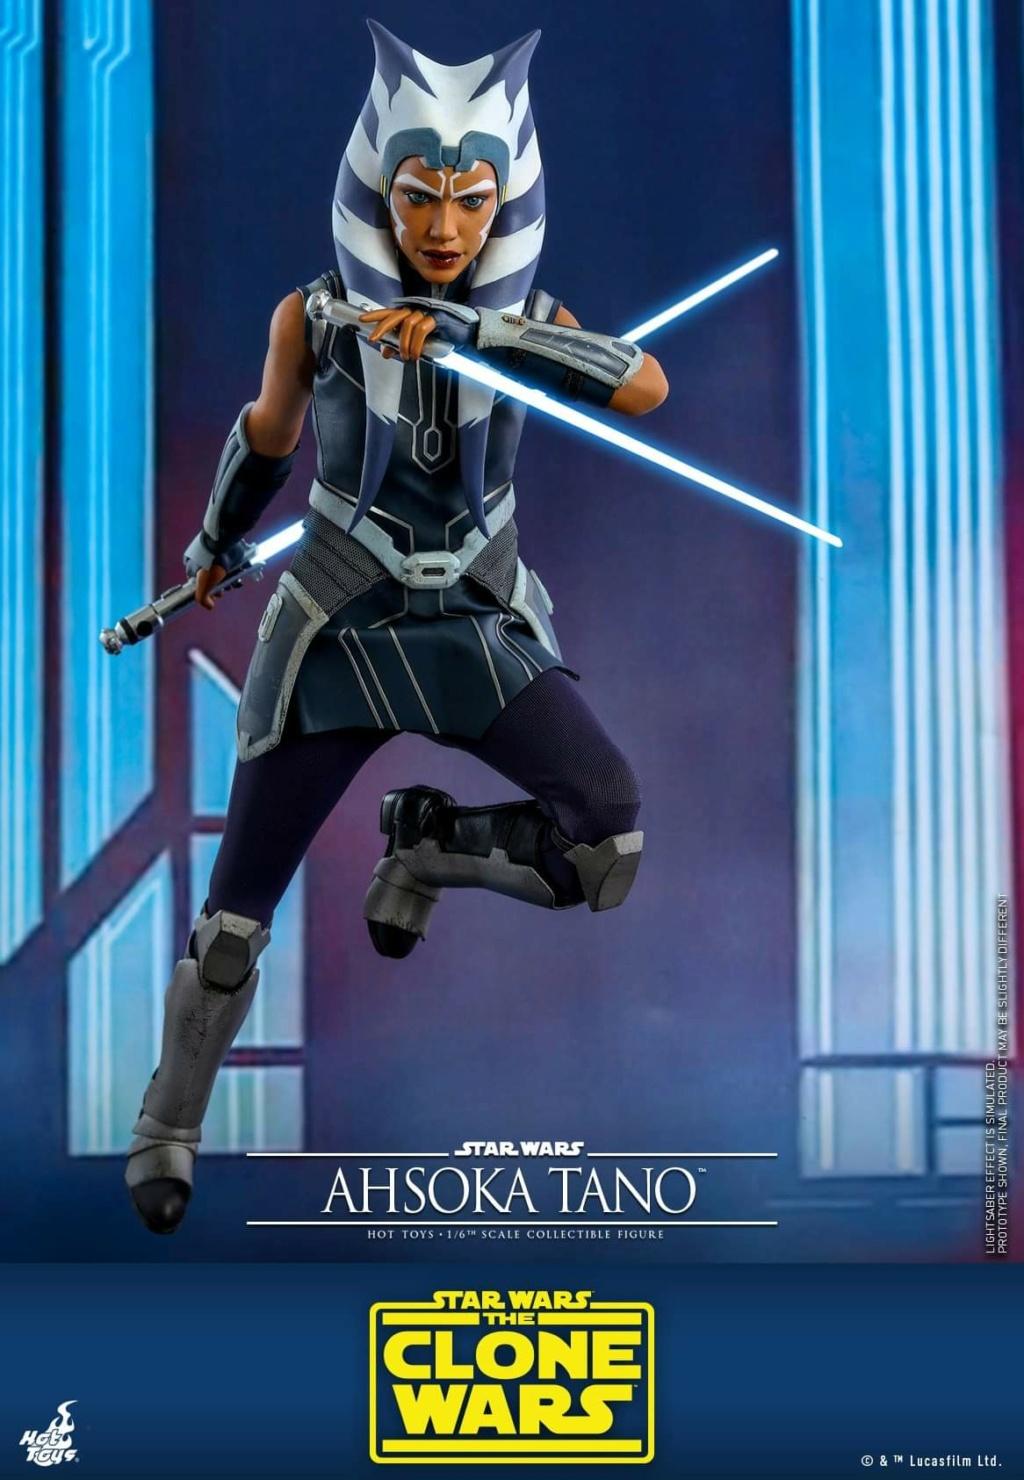 Ahsoka Tano - 1/6th scale - The Clone Wars - Hot Toys Fb_im129